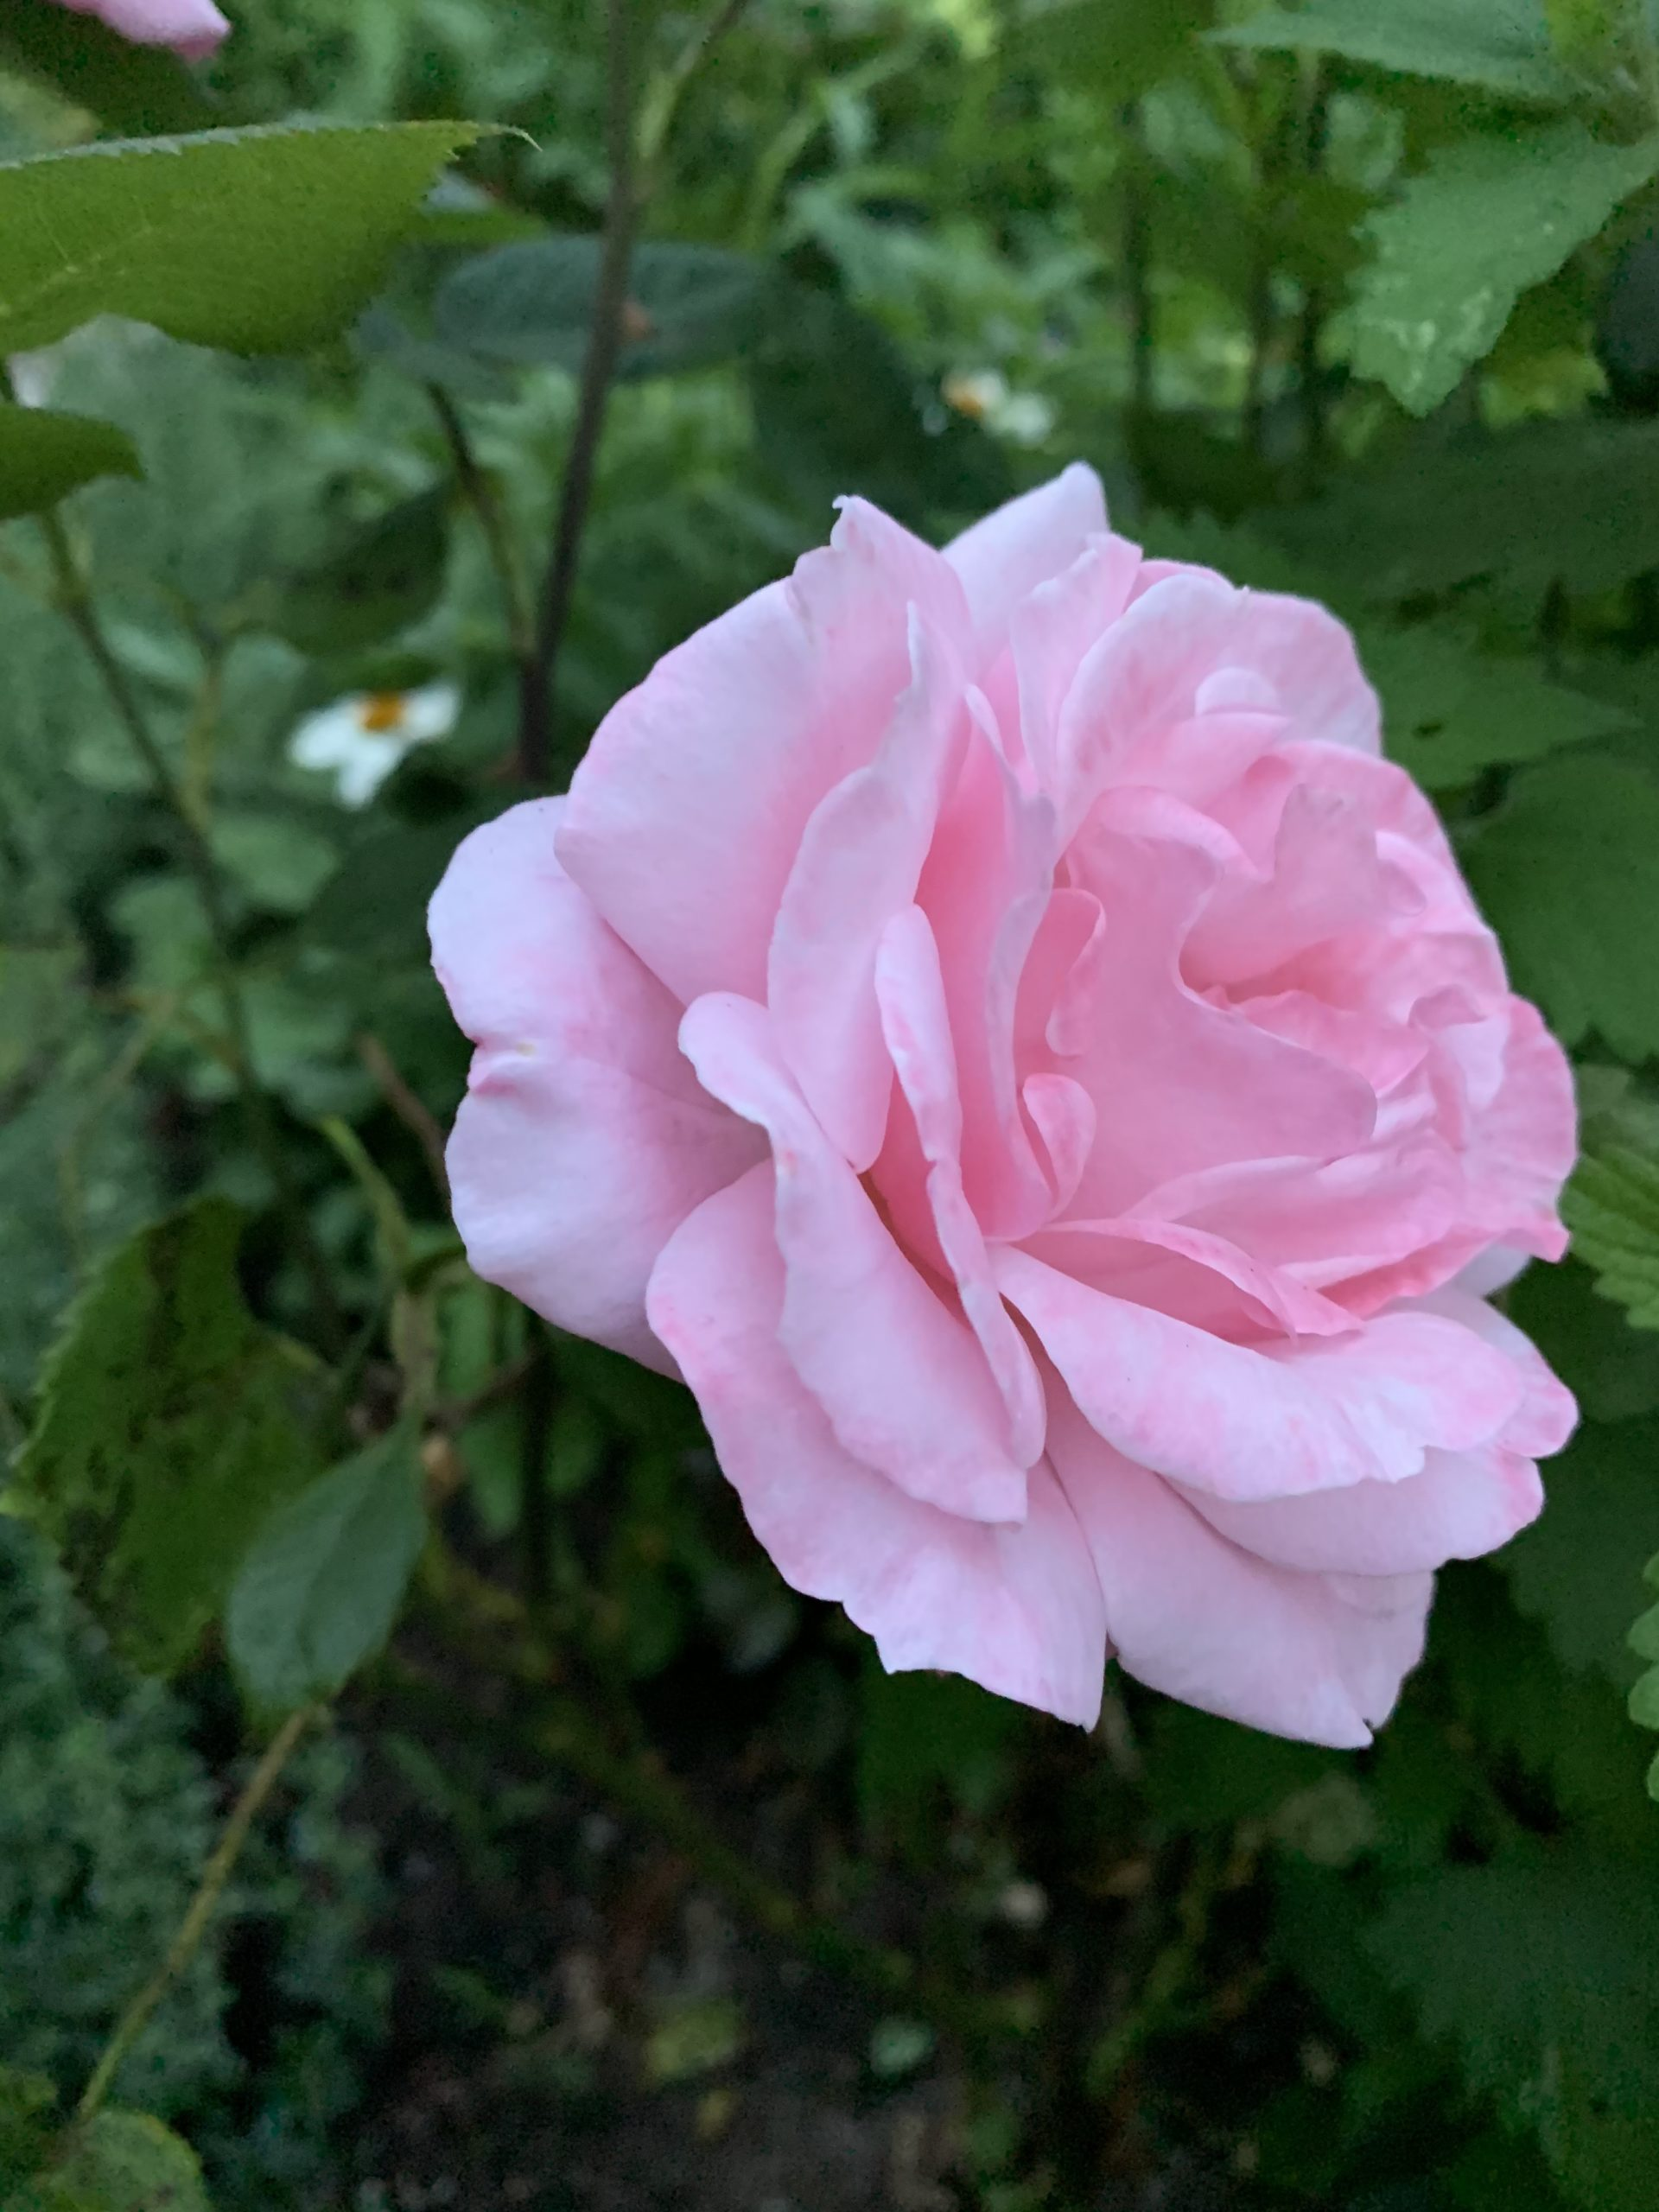 Queen Elizabeth rose.